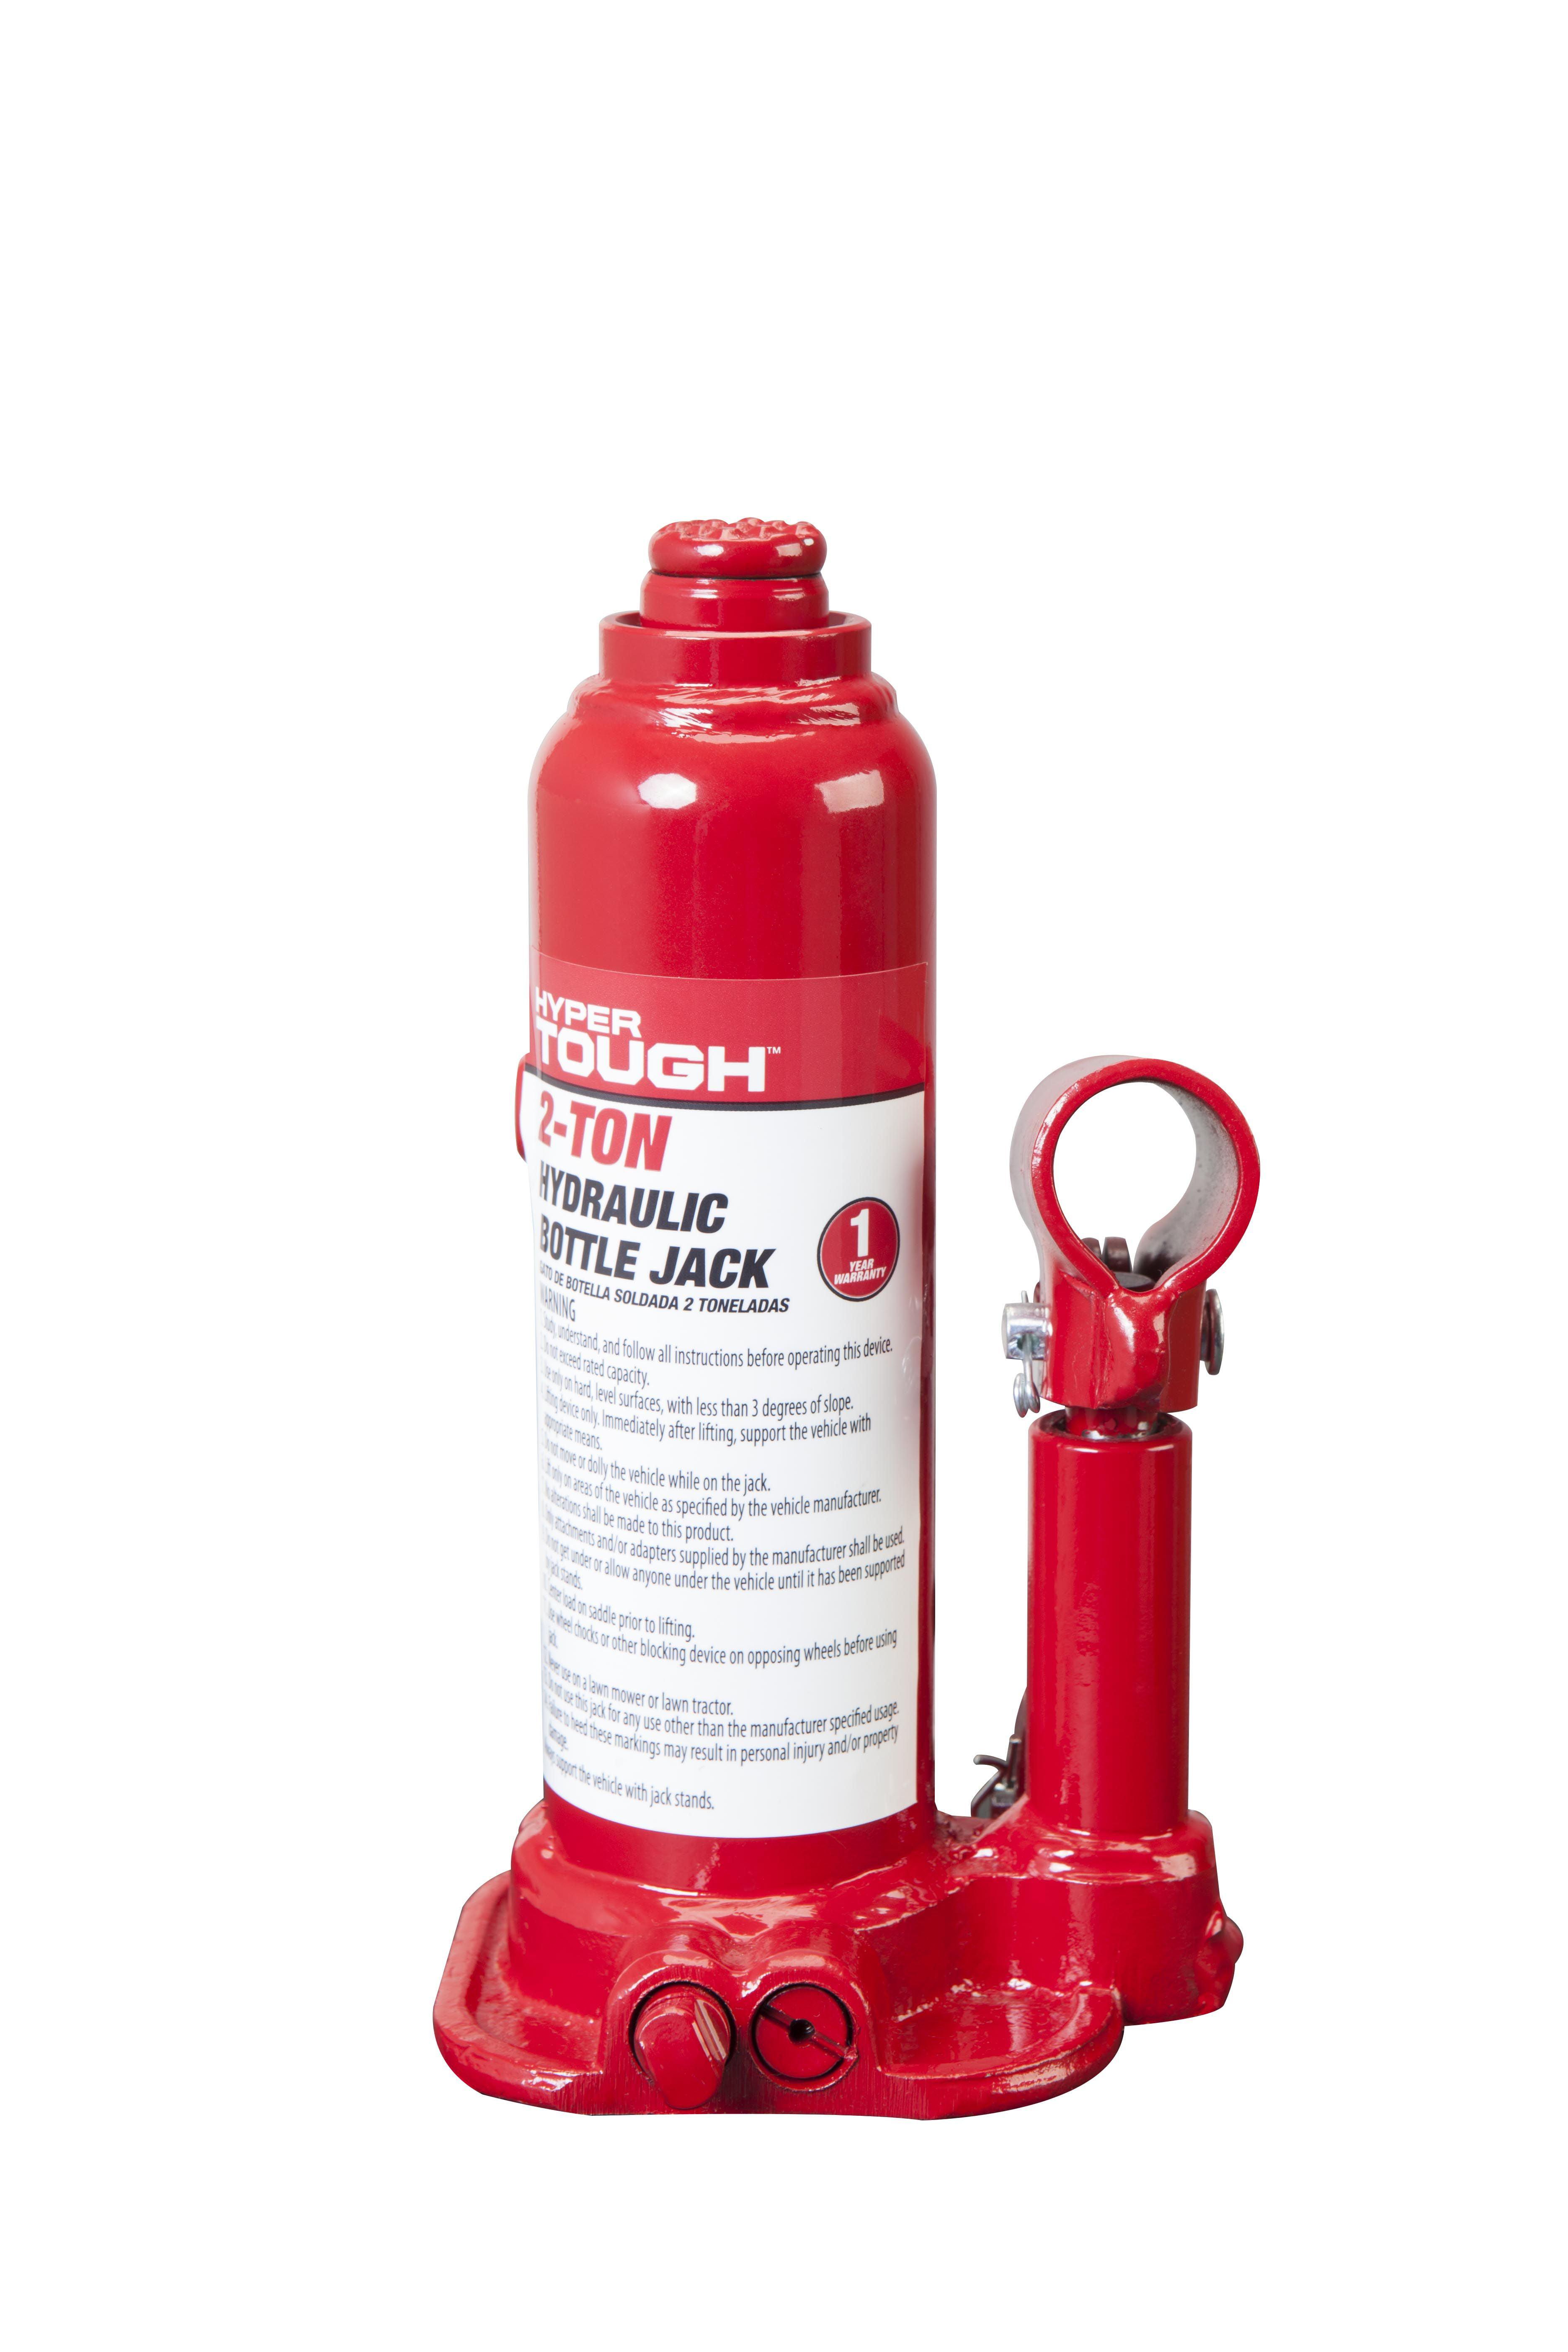 Hyper Tough 2 Ton Welded Bottle Jack Red T90203w Walmart Com Walmart Com